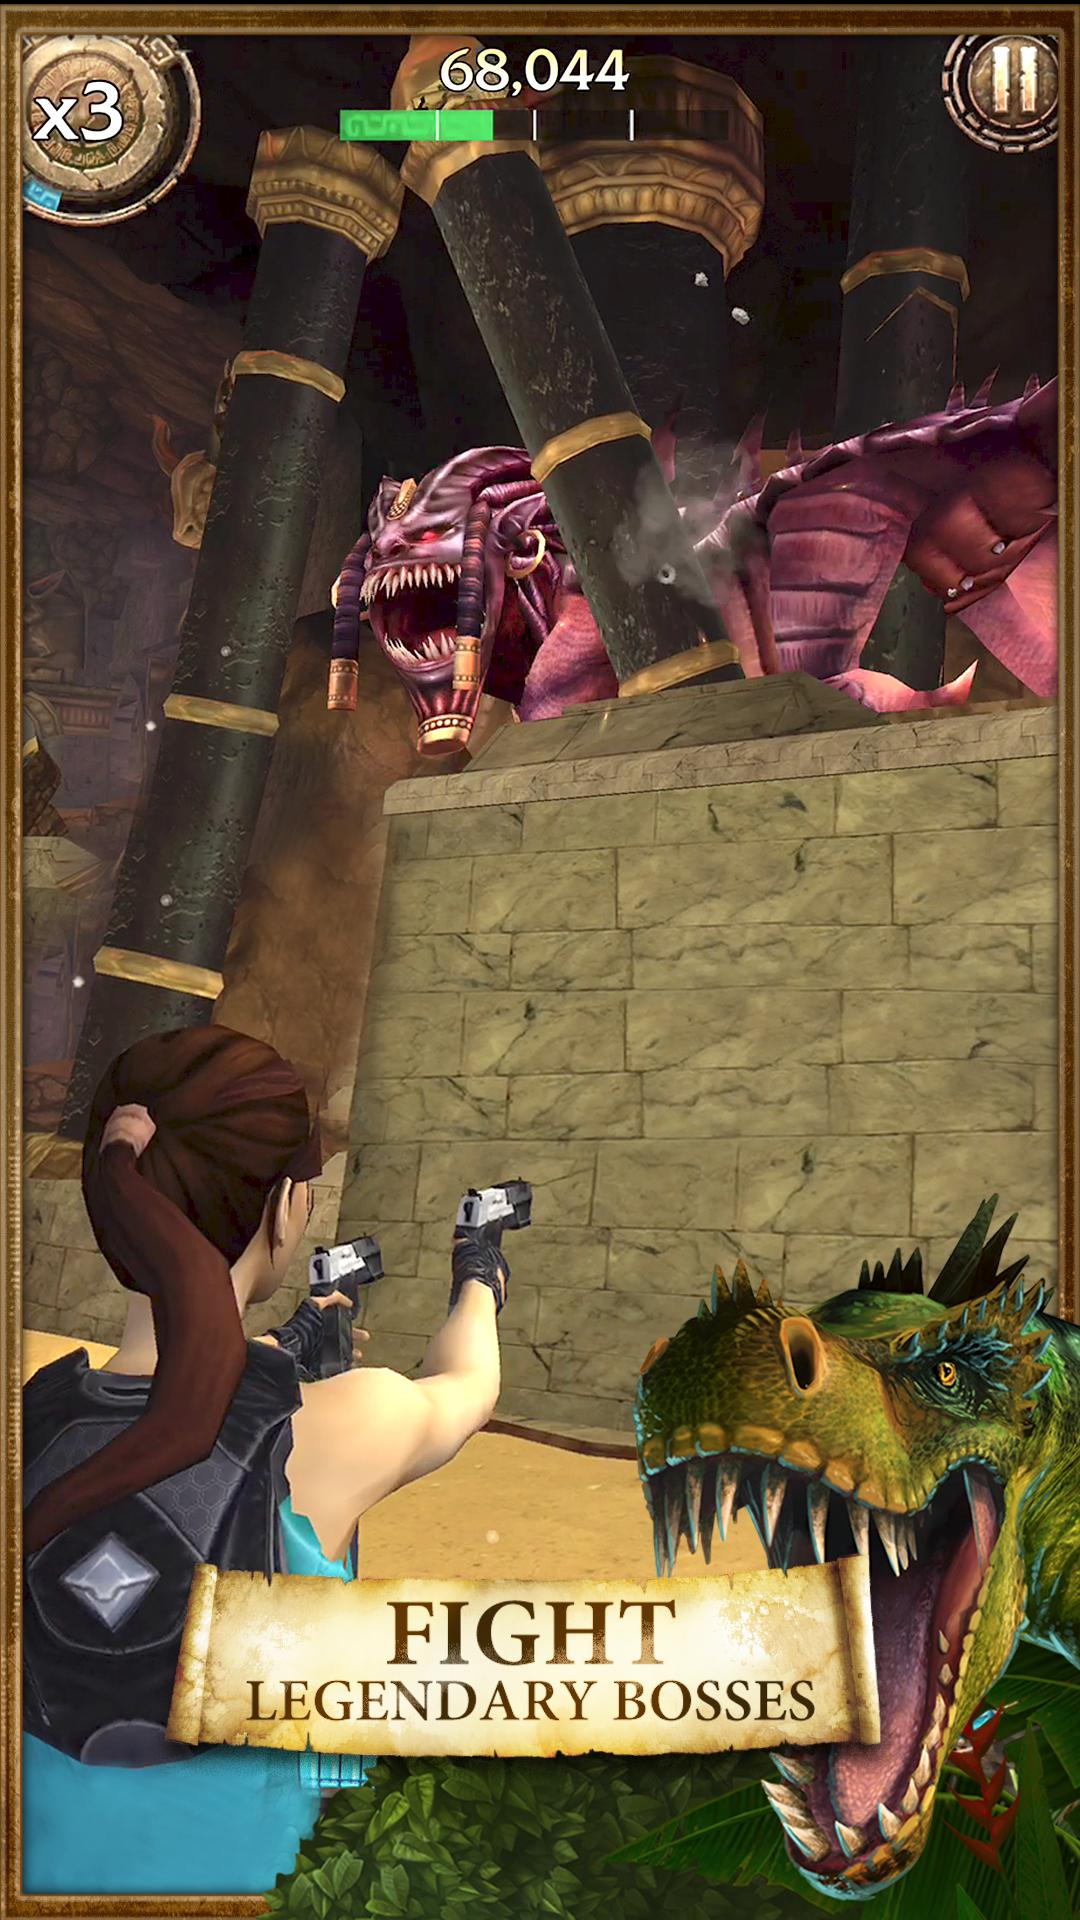 Lara Croft: Relic Run 1.11.112 Screenshot 3